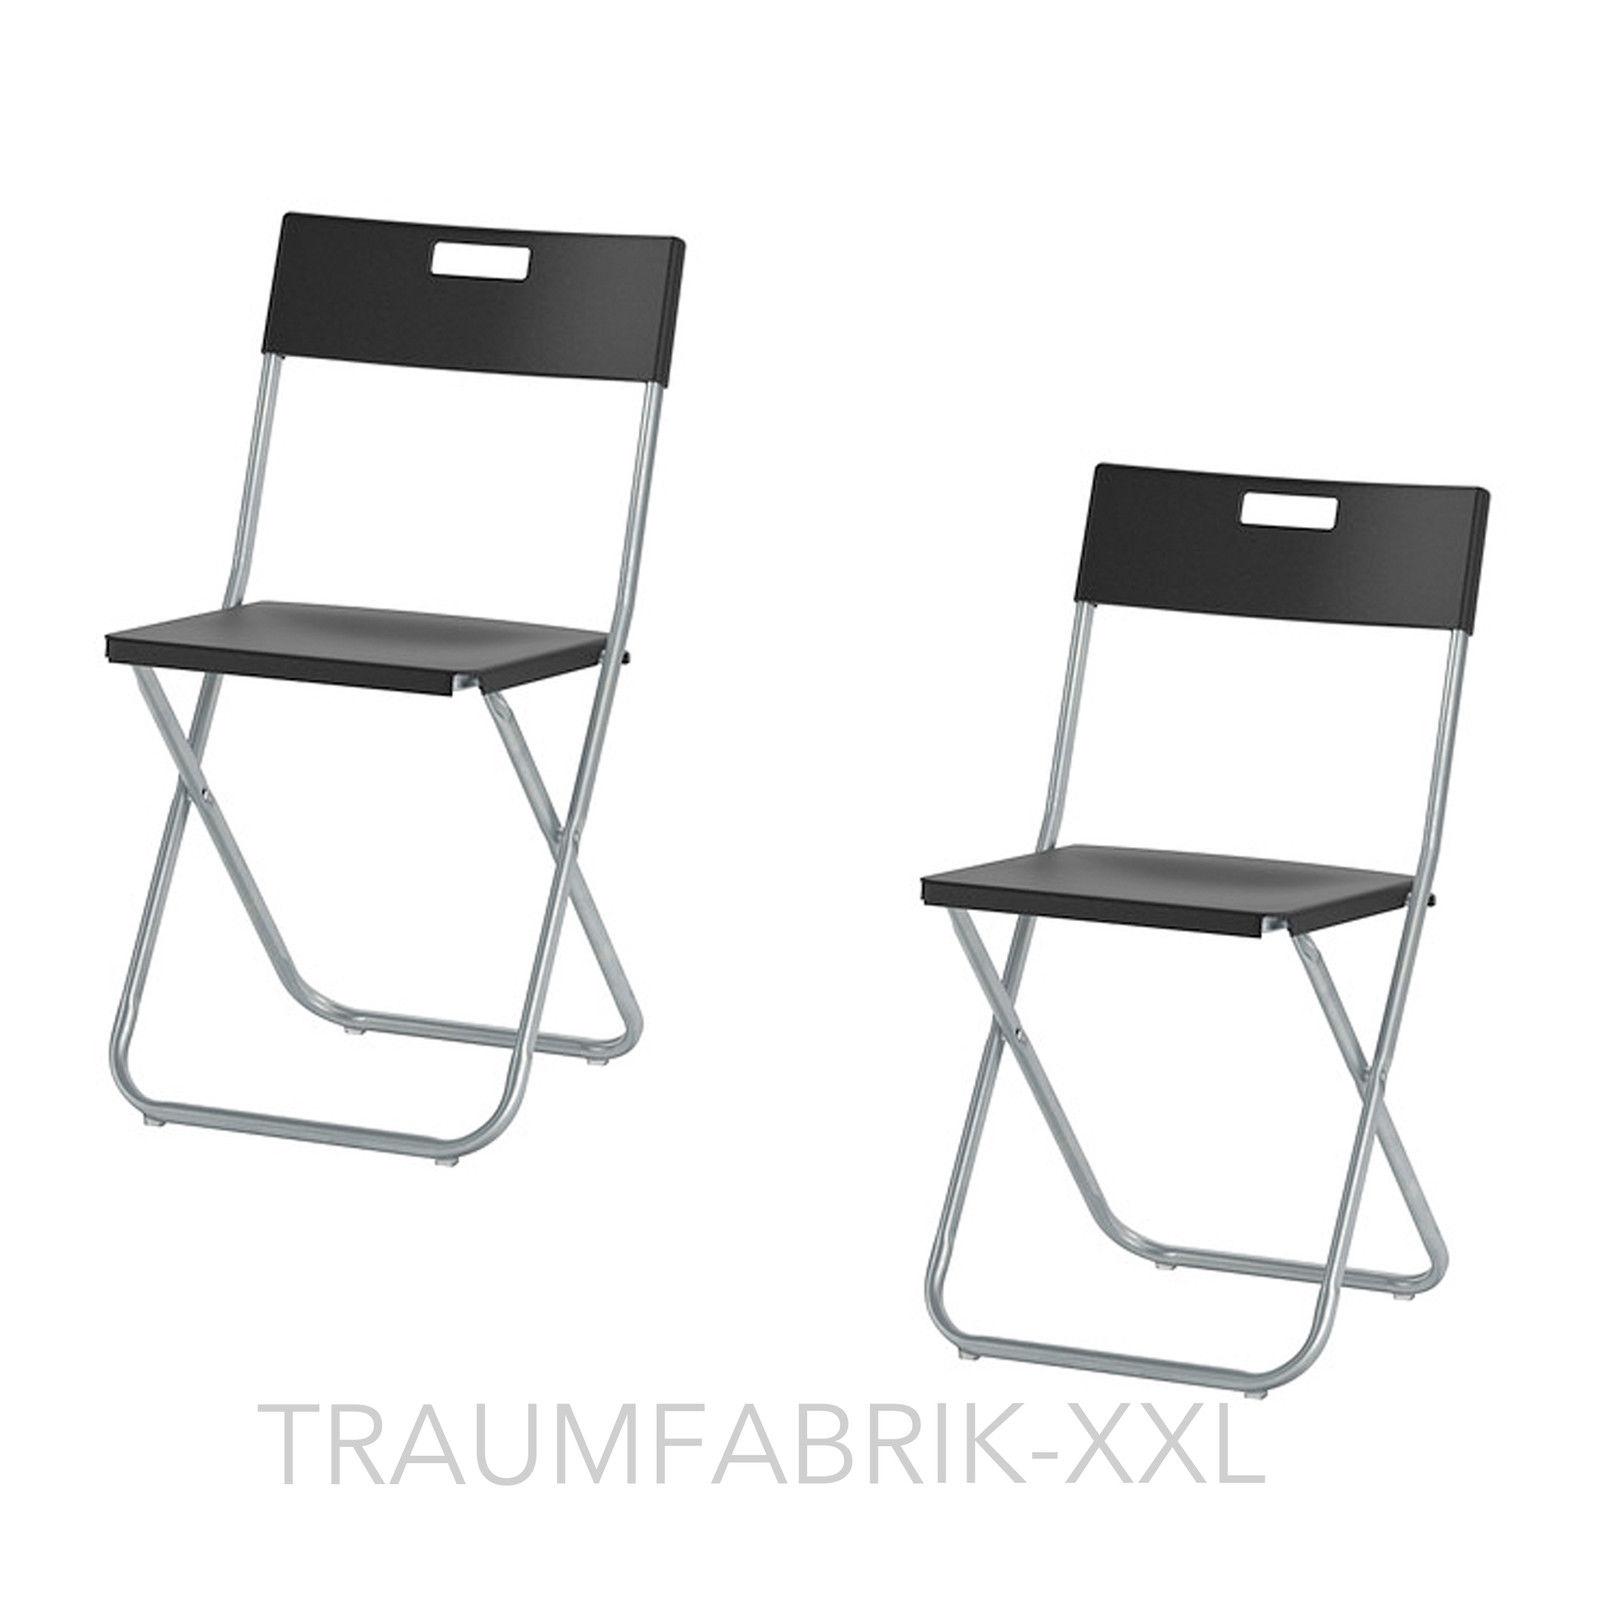 Klappstuhl ikea  2 IKEA Klappstühle Klappstuhl Büro Konferenz Besucher Stuhl Set ...